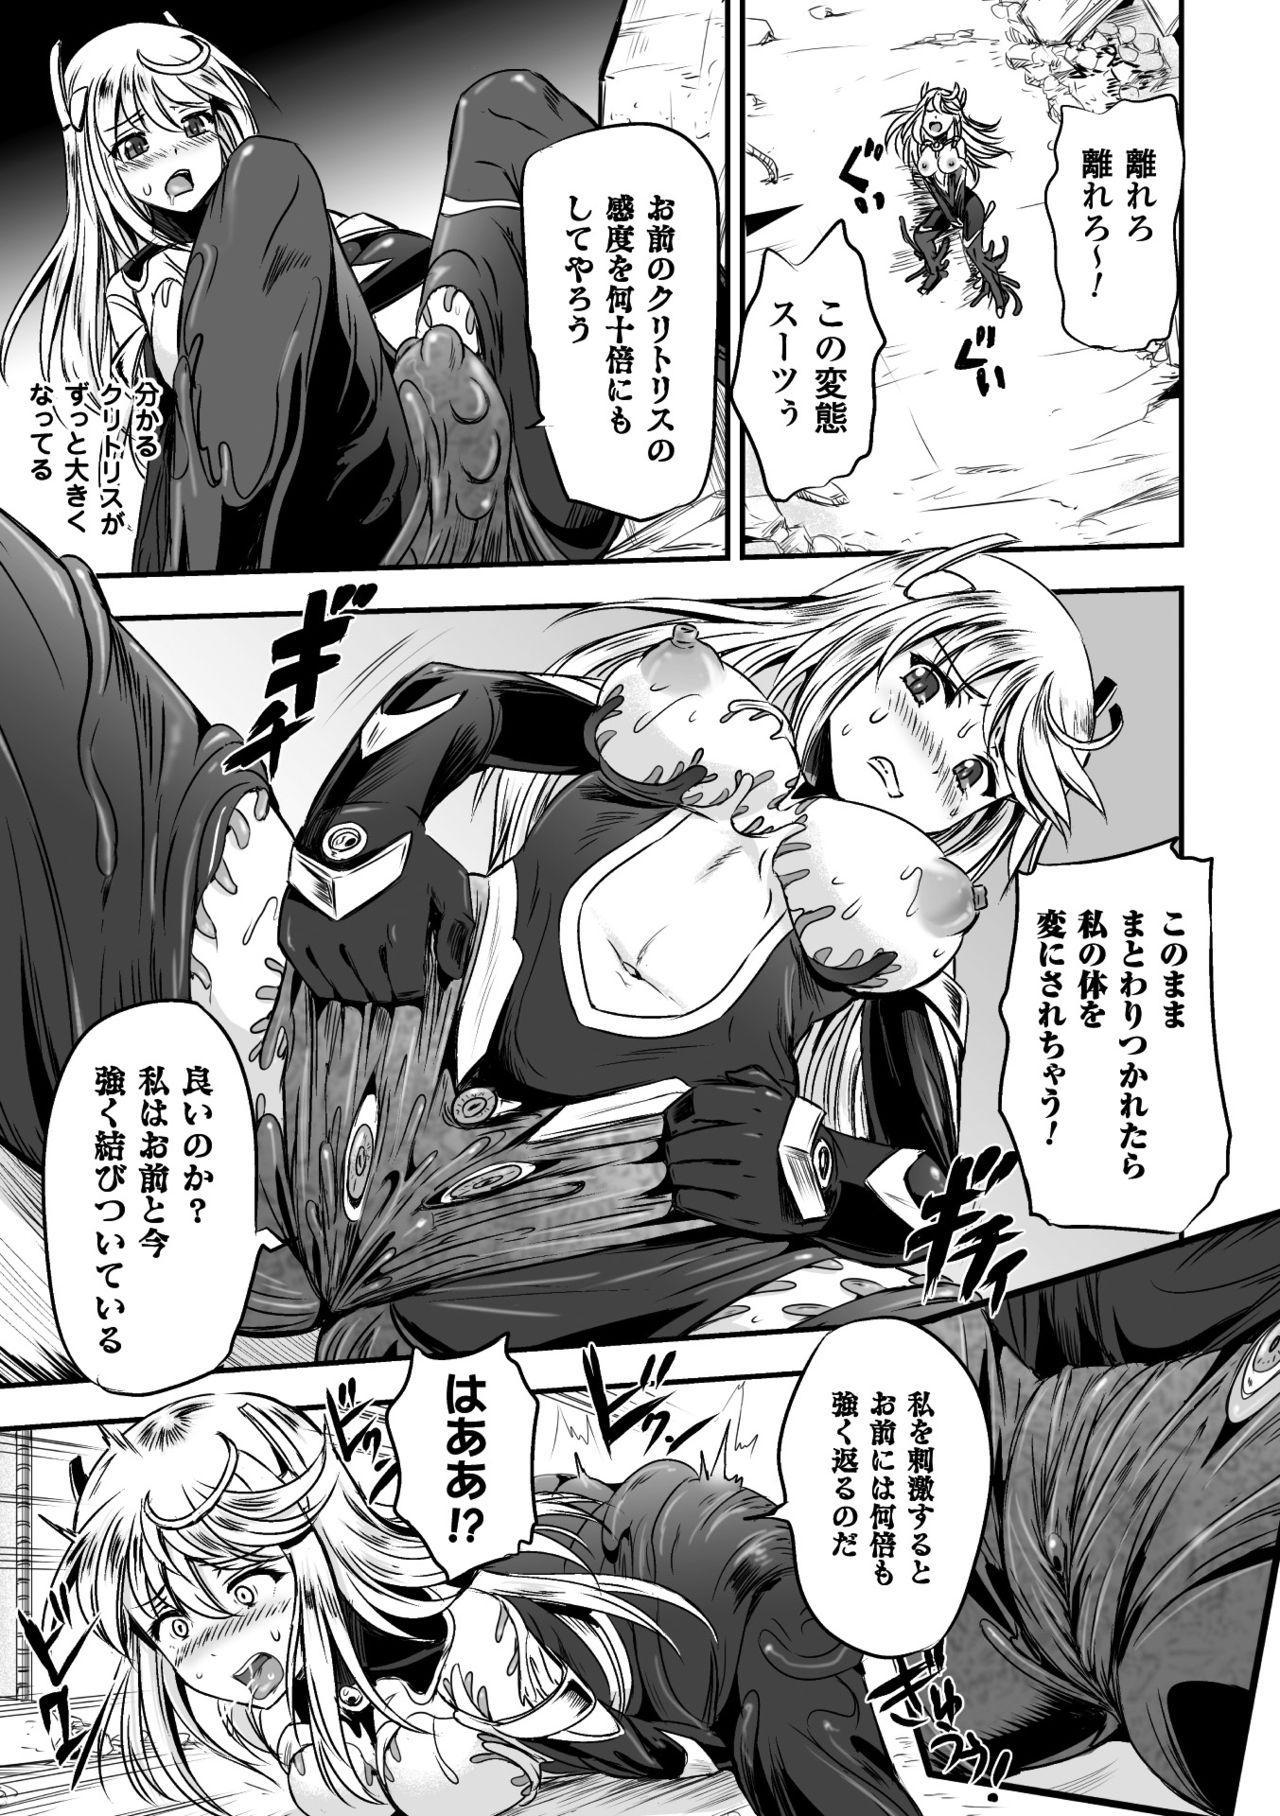 2D Comic Magazine Shokushu Yoroi ni Zenshin o Okasare Mugen Zecchou! Vol. 5 34